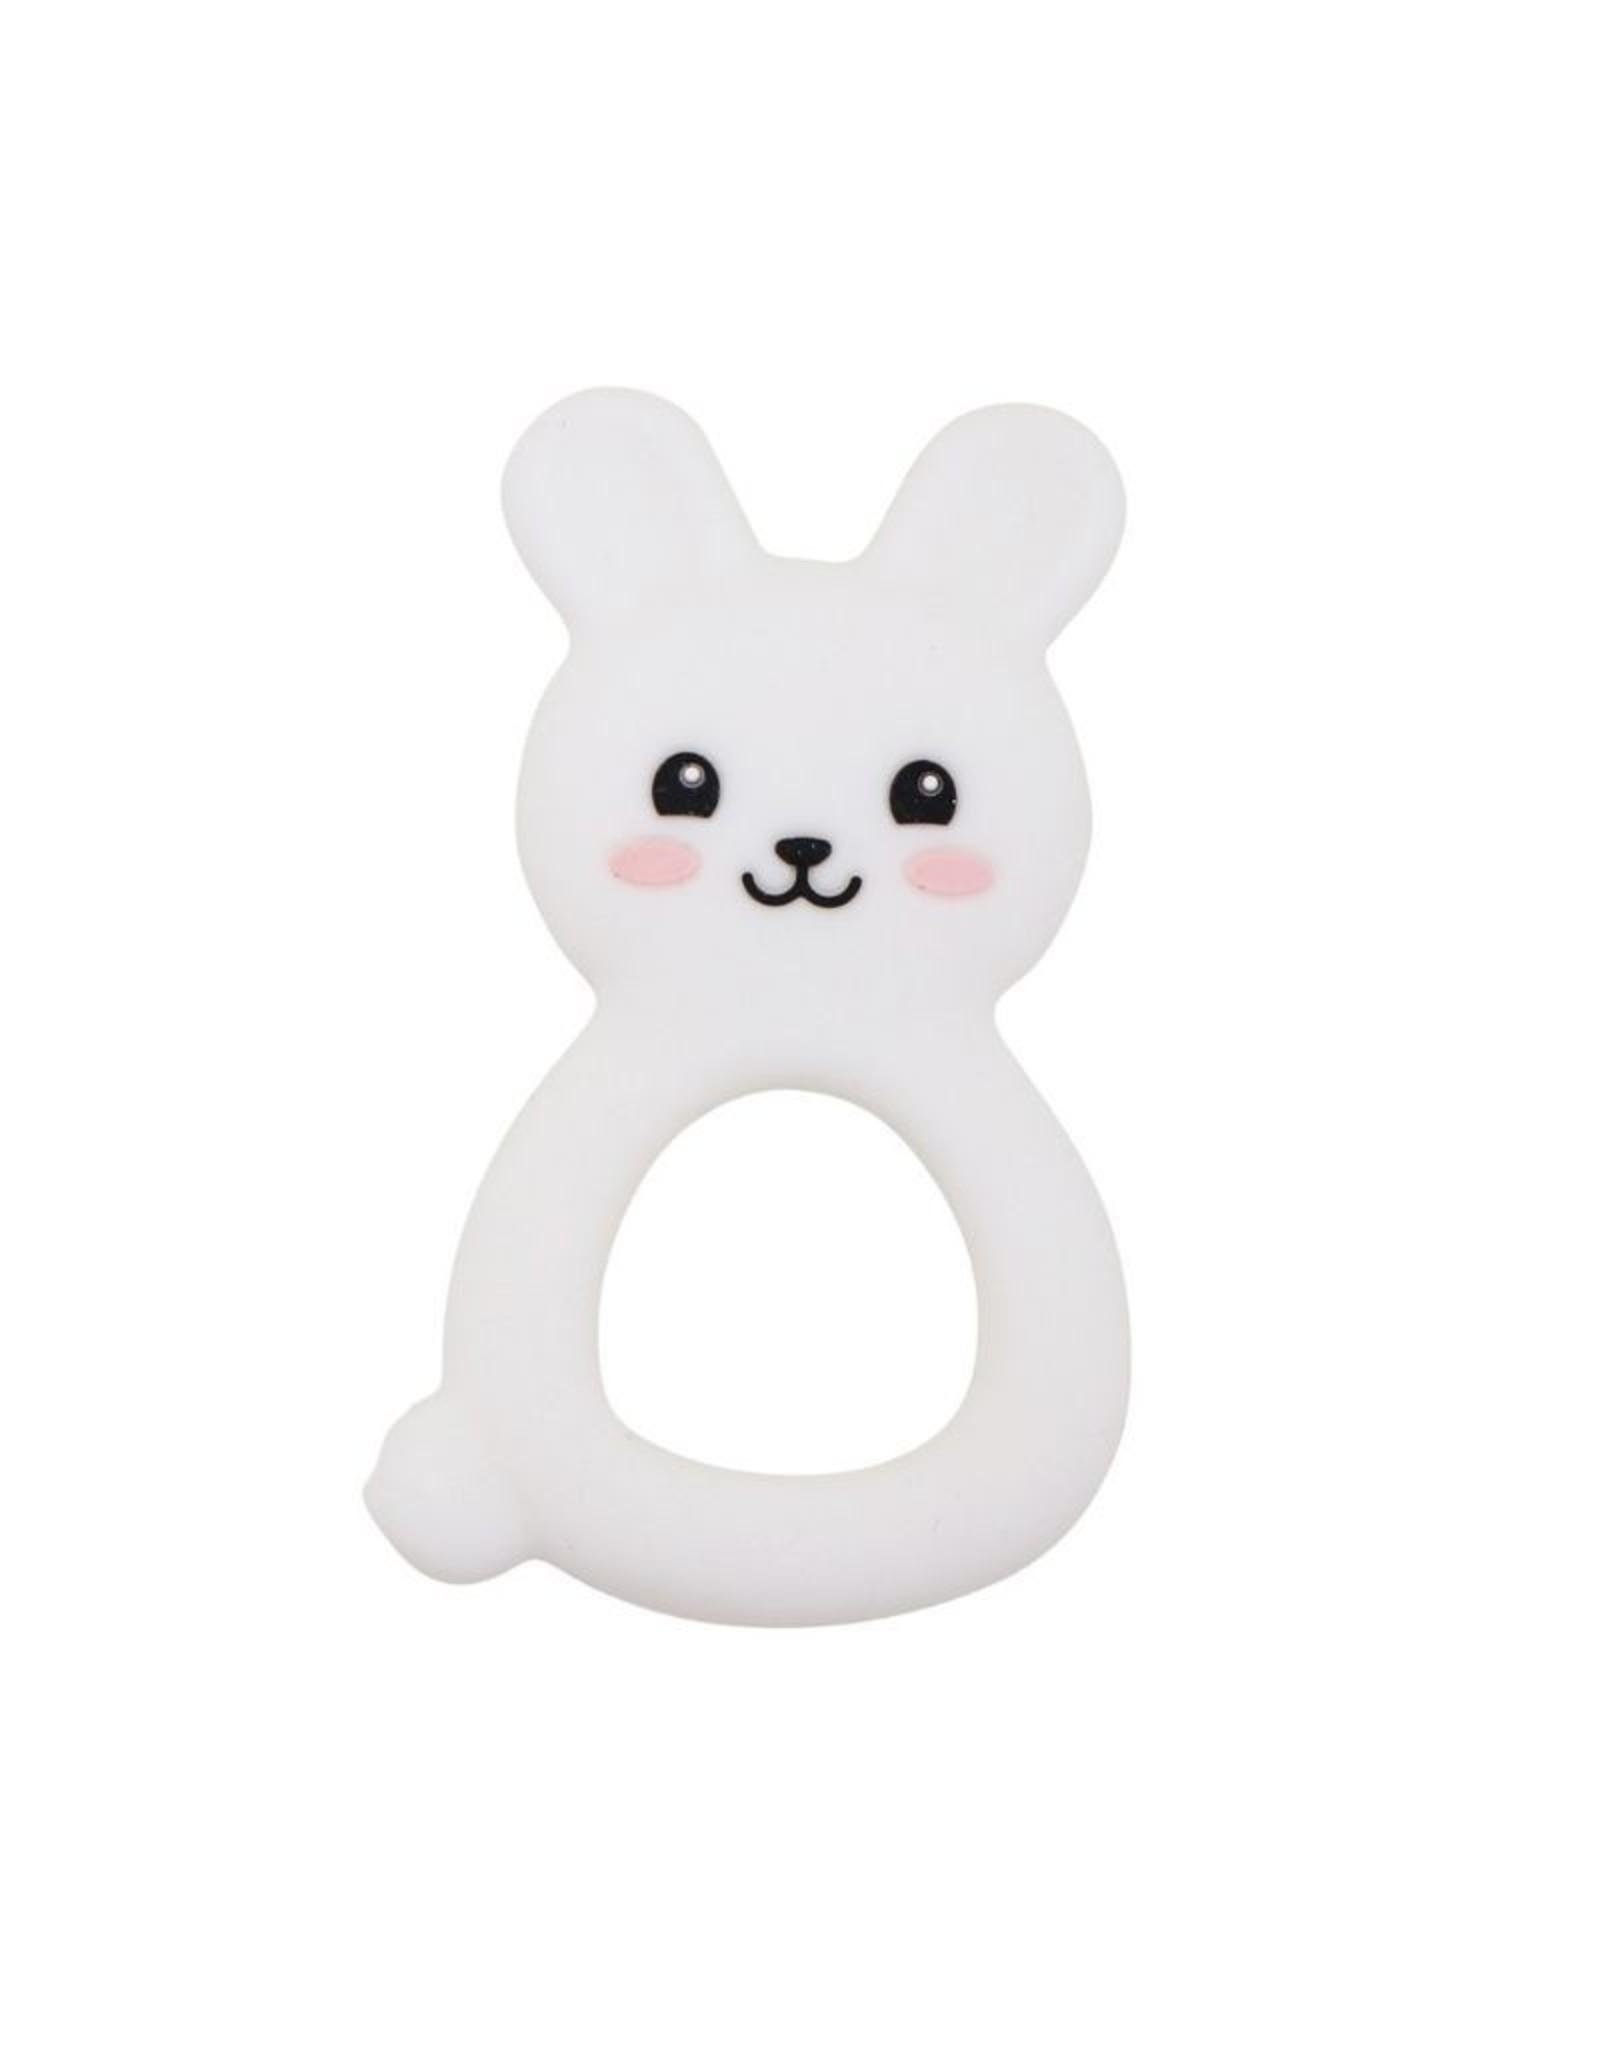 Jellystone Designs Jellystone - Jellies Bunny Teether White